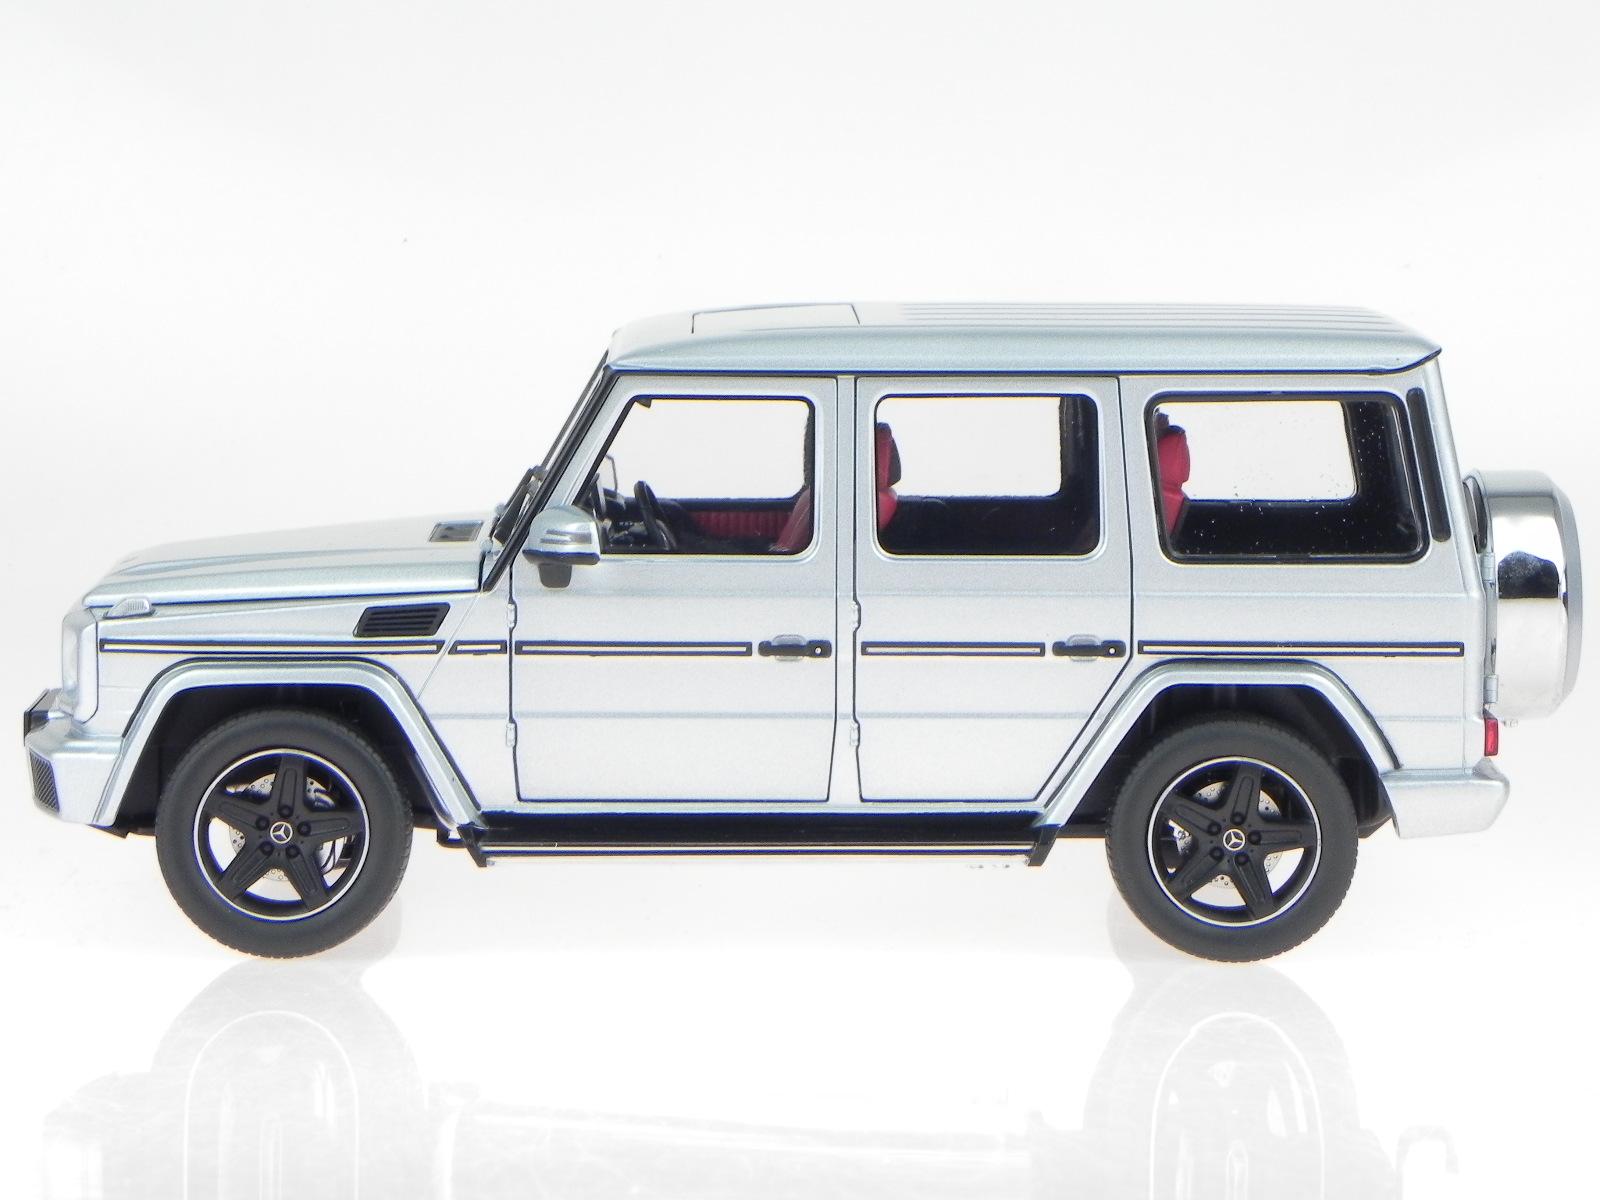 mercedes bm463 g klasse 2015 diamant silber modellauto. Black Bedroom Furniture Sets. Home Design Ideas